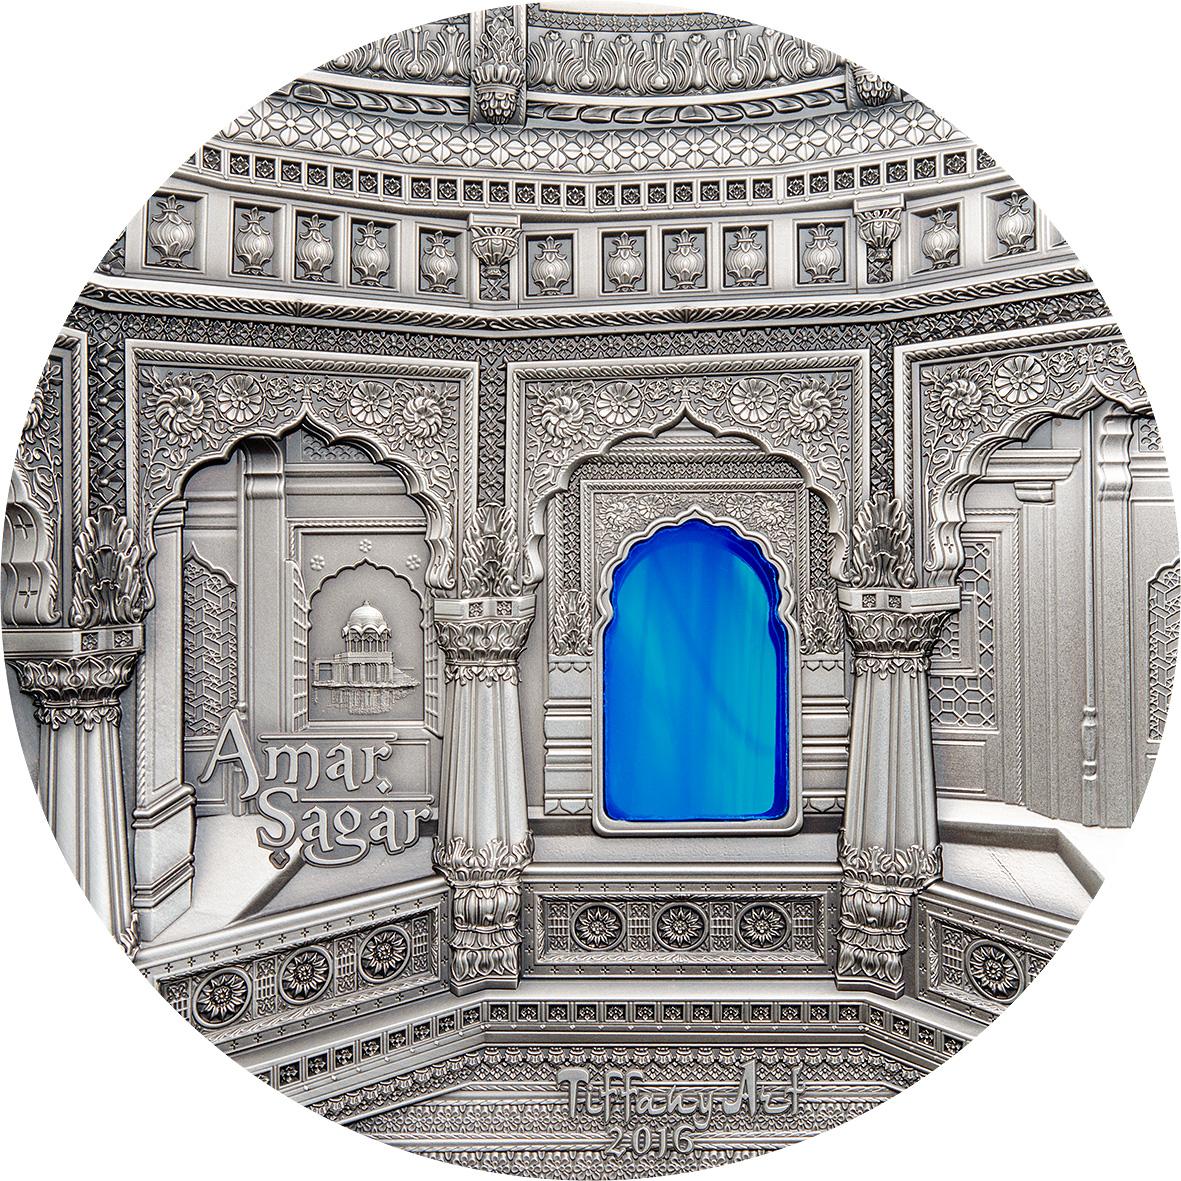 Palau 2016 $10 Tiffany Art - Jain Temple India 2 Oz Silver Coin